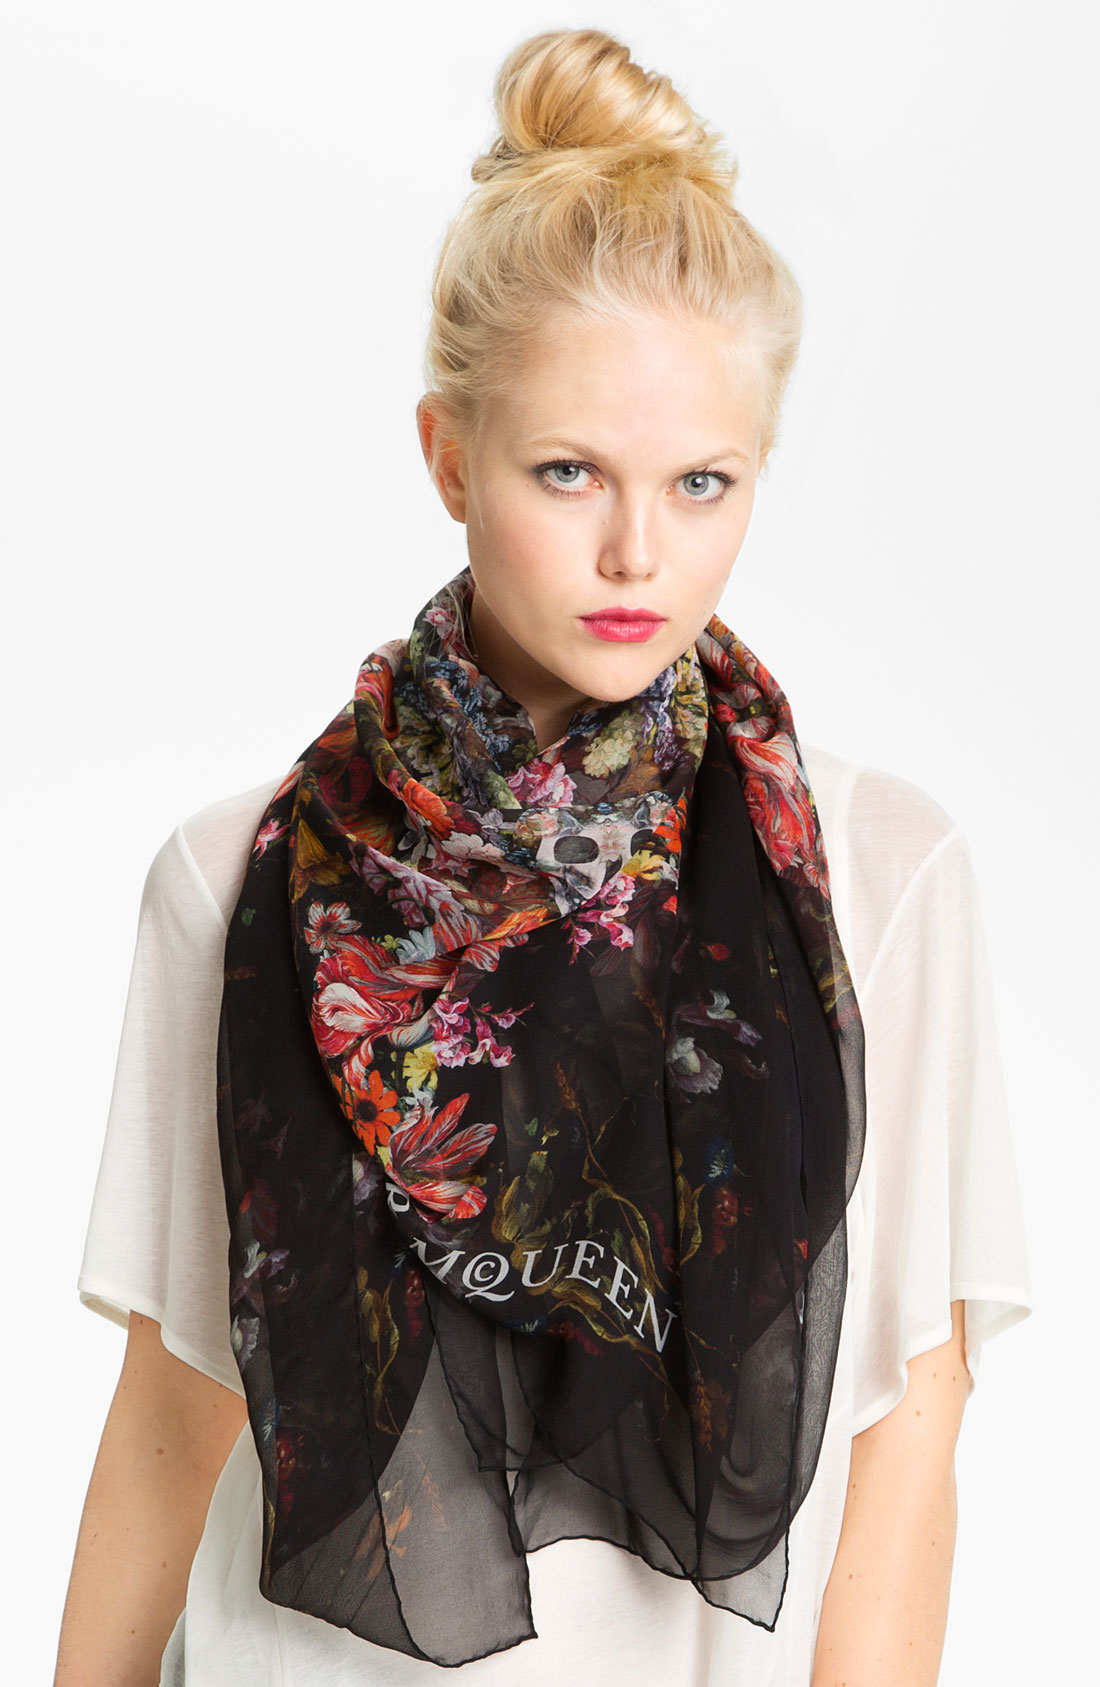 Lyst - Alexander mcqueen Vermeer Skull Silk Scarf in Black